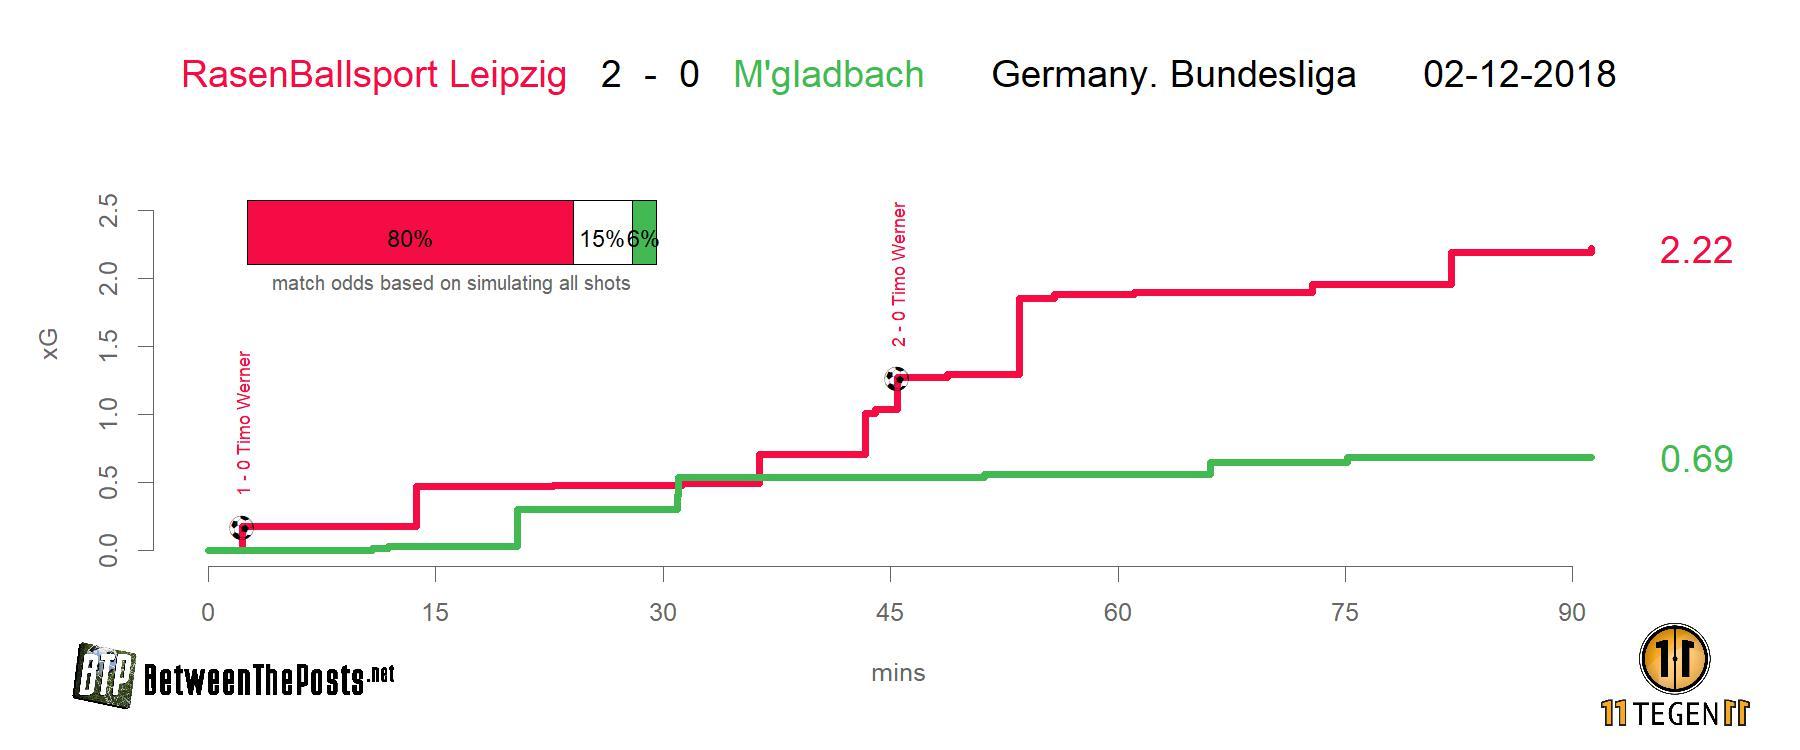 Expected goals plot Rasenballsport Leipzig - Borussia Mönchengladbach 2-0